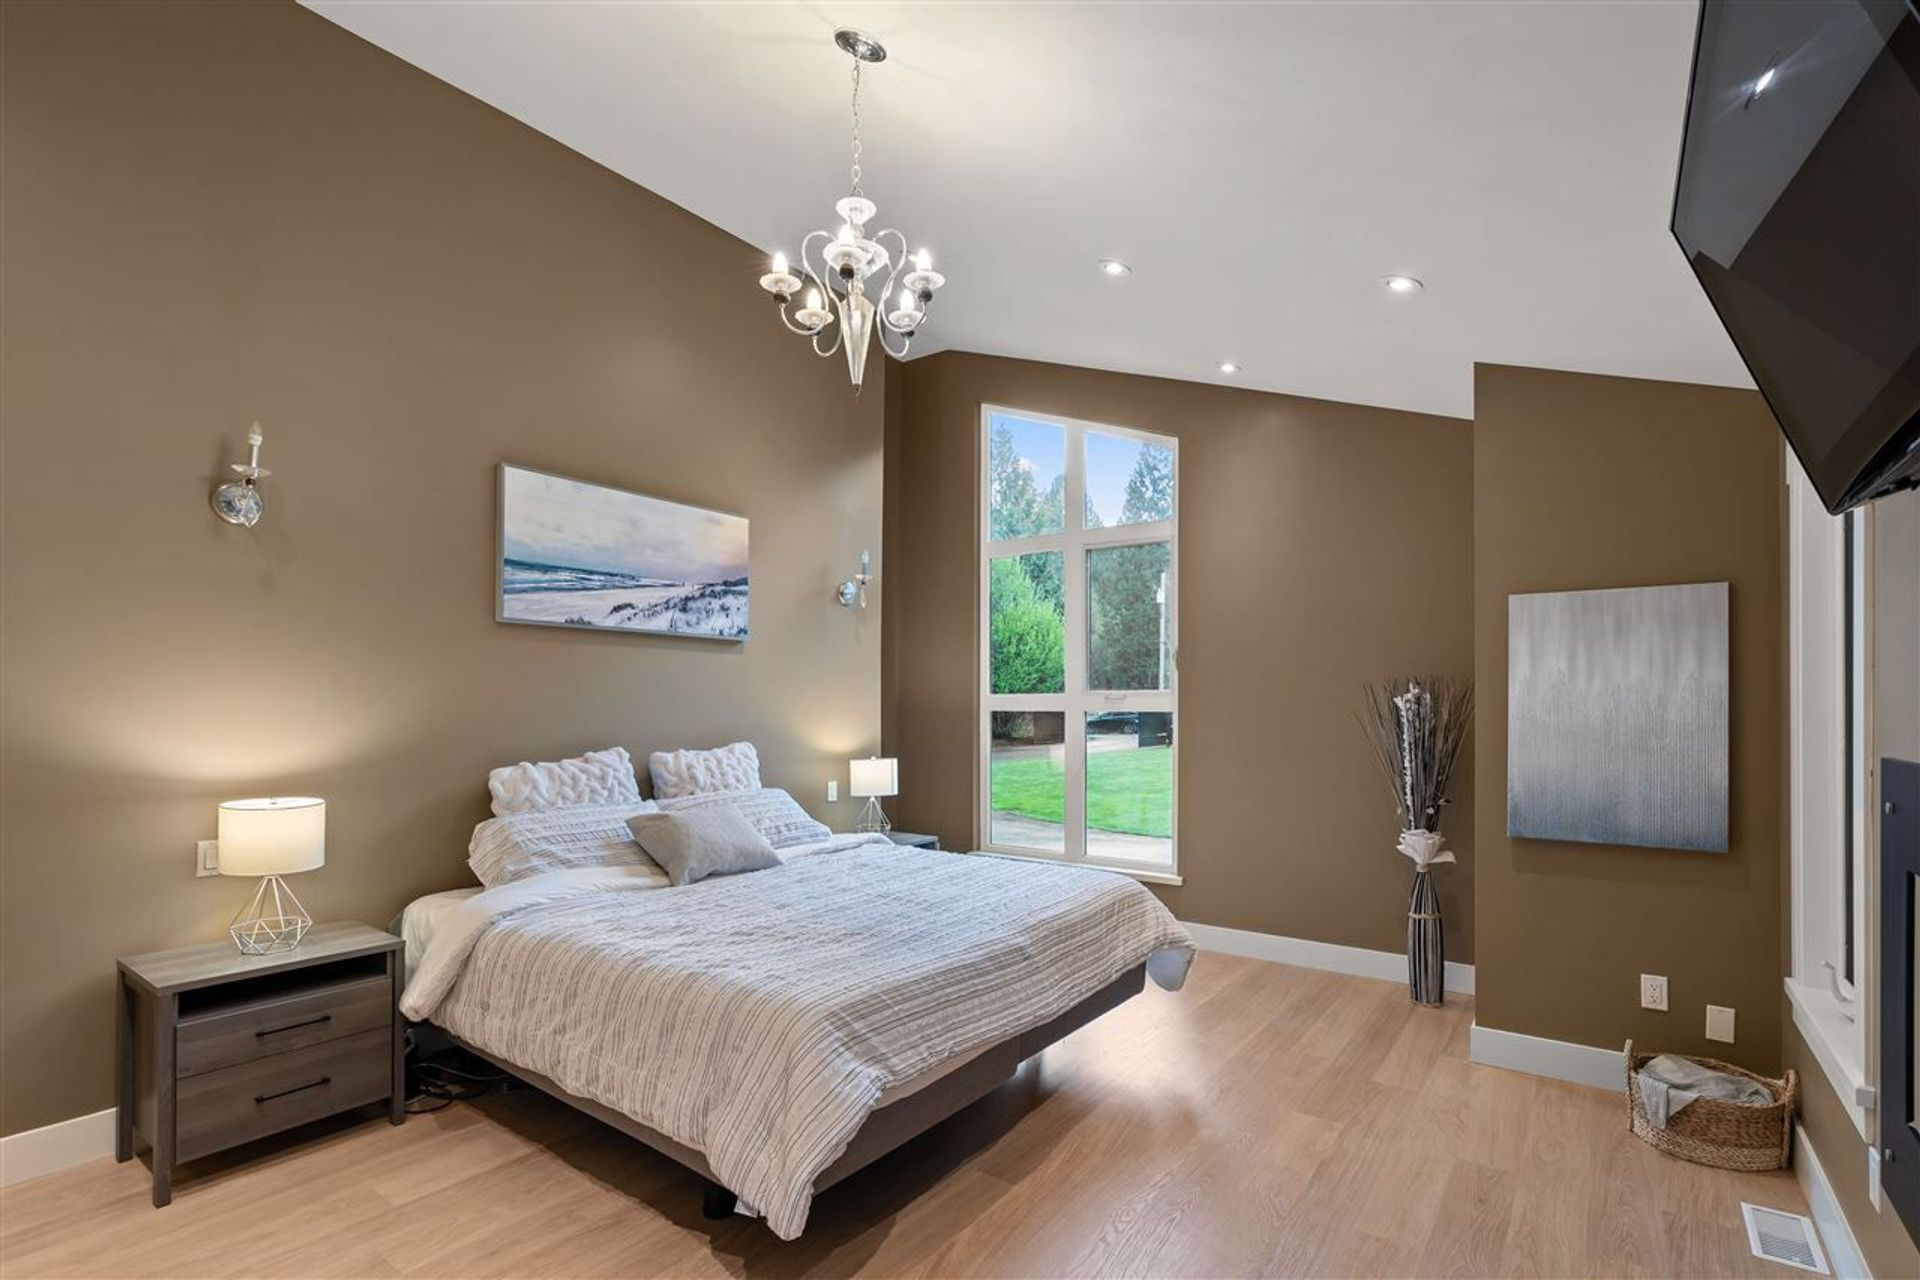 24852-ferguson-avenue-cottonwood-mr-maple-ridge-21 of 24852 Ferguson Avenue, Cottonwood MR, Maple Ridge